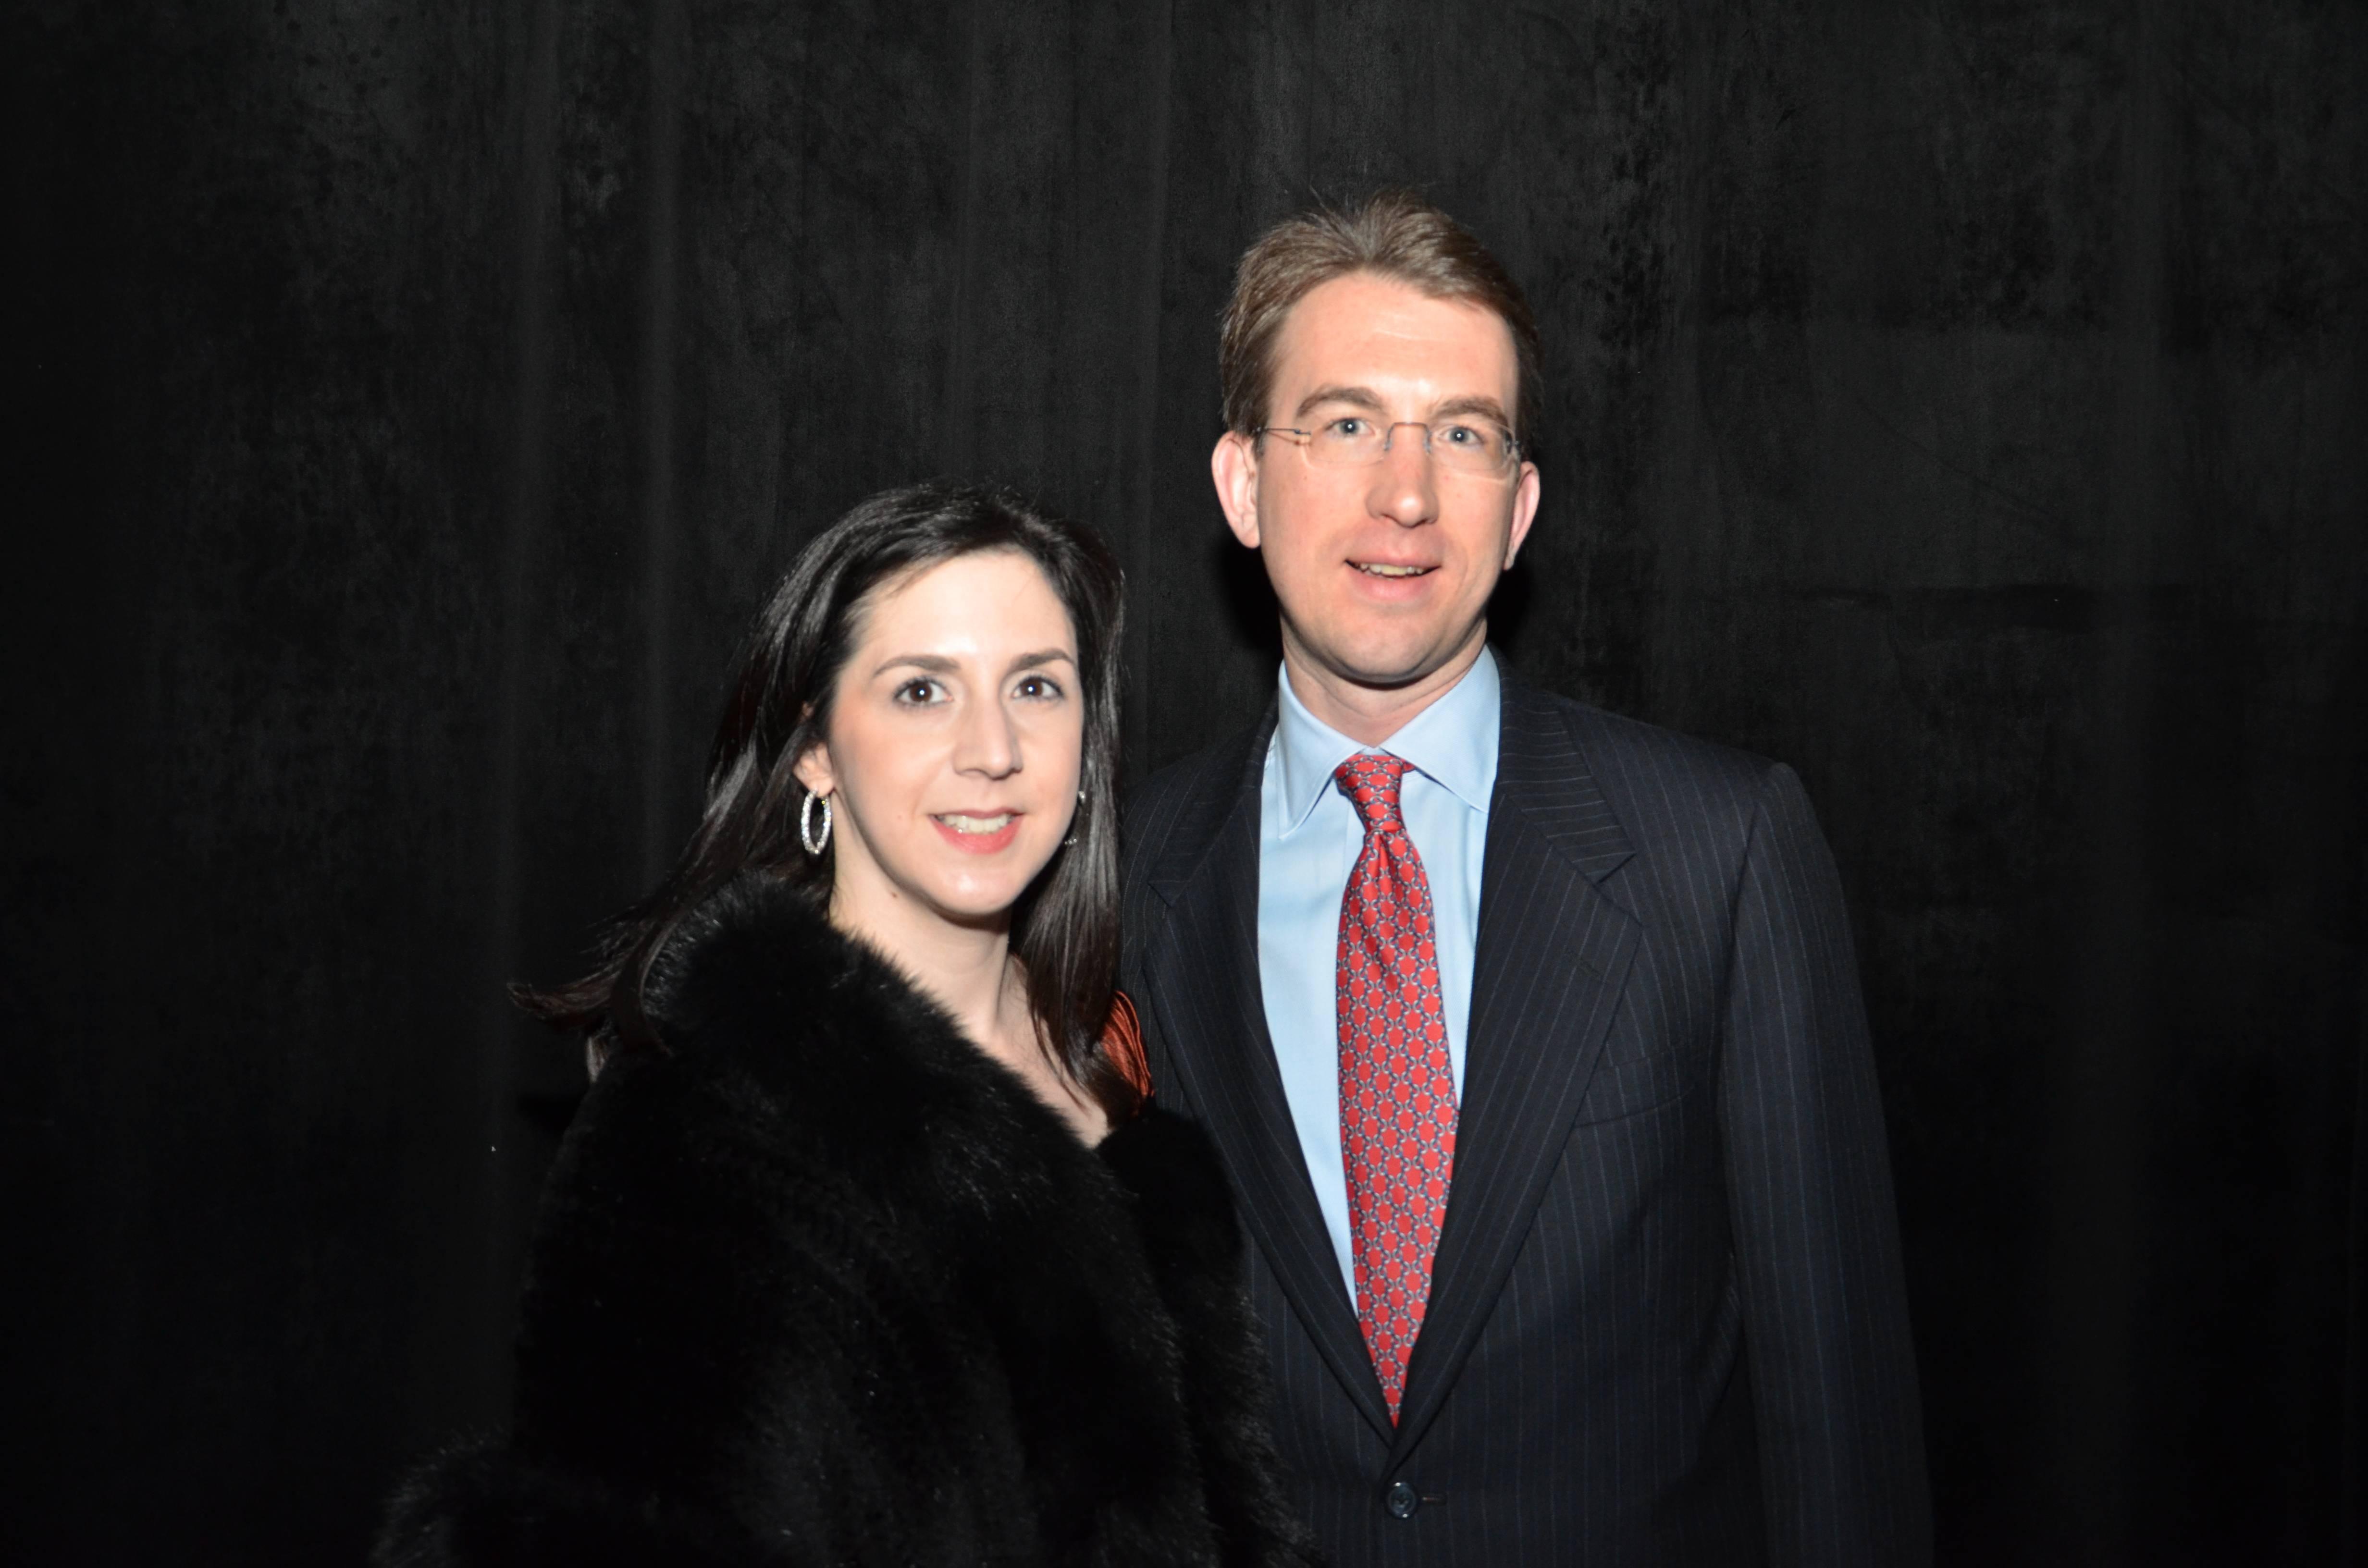 Ana-Marie and Robert Barlick